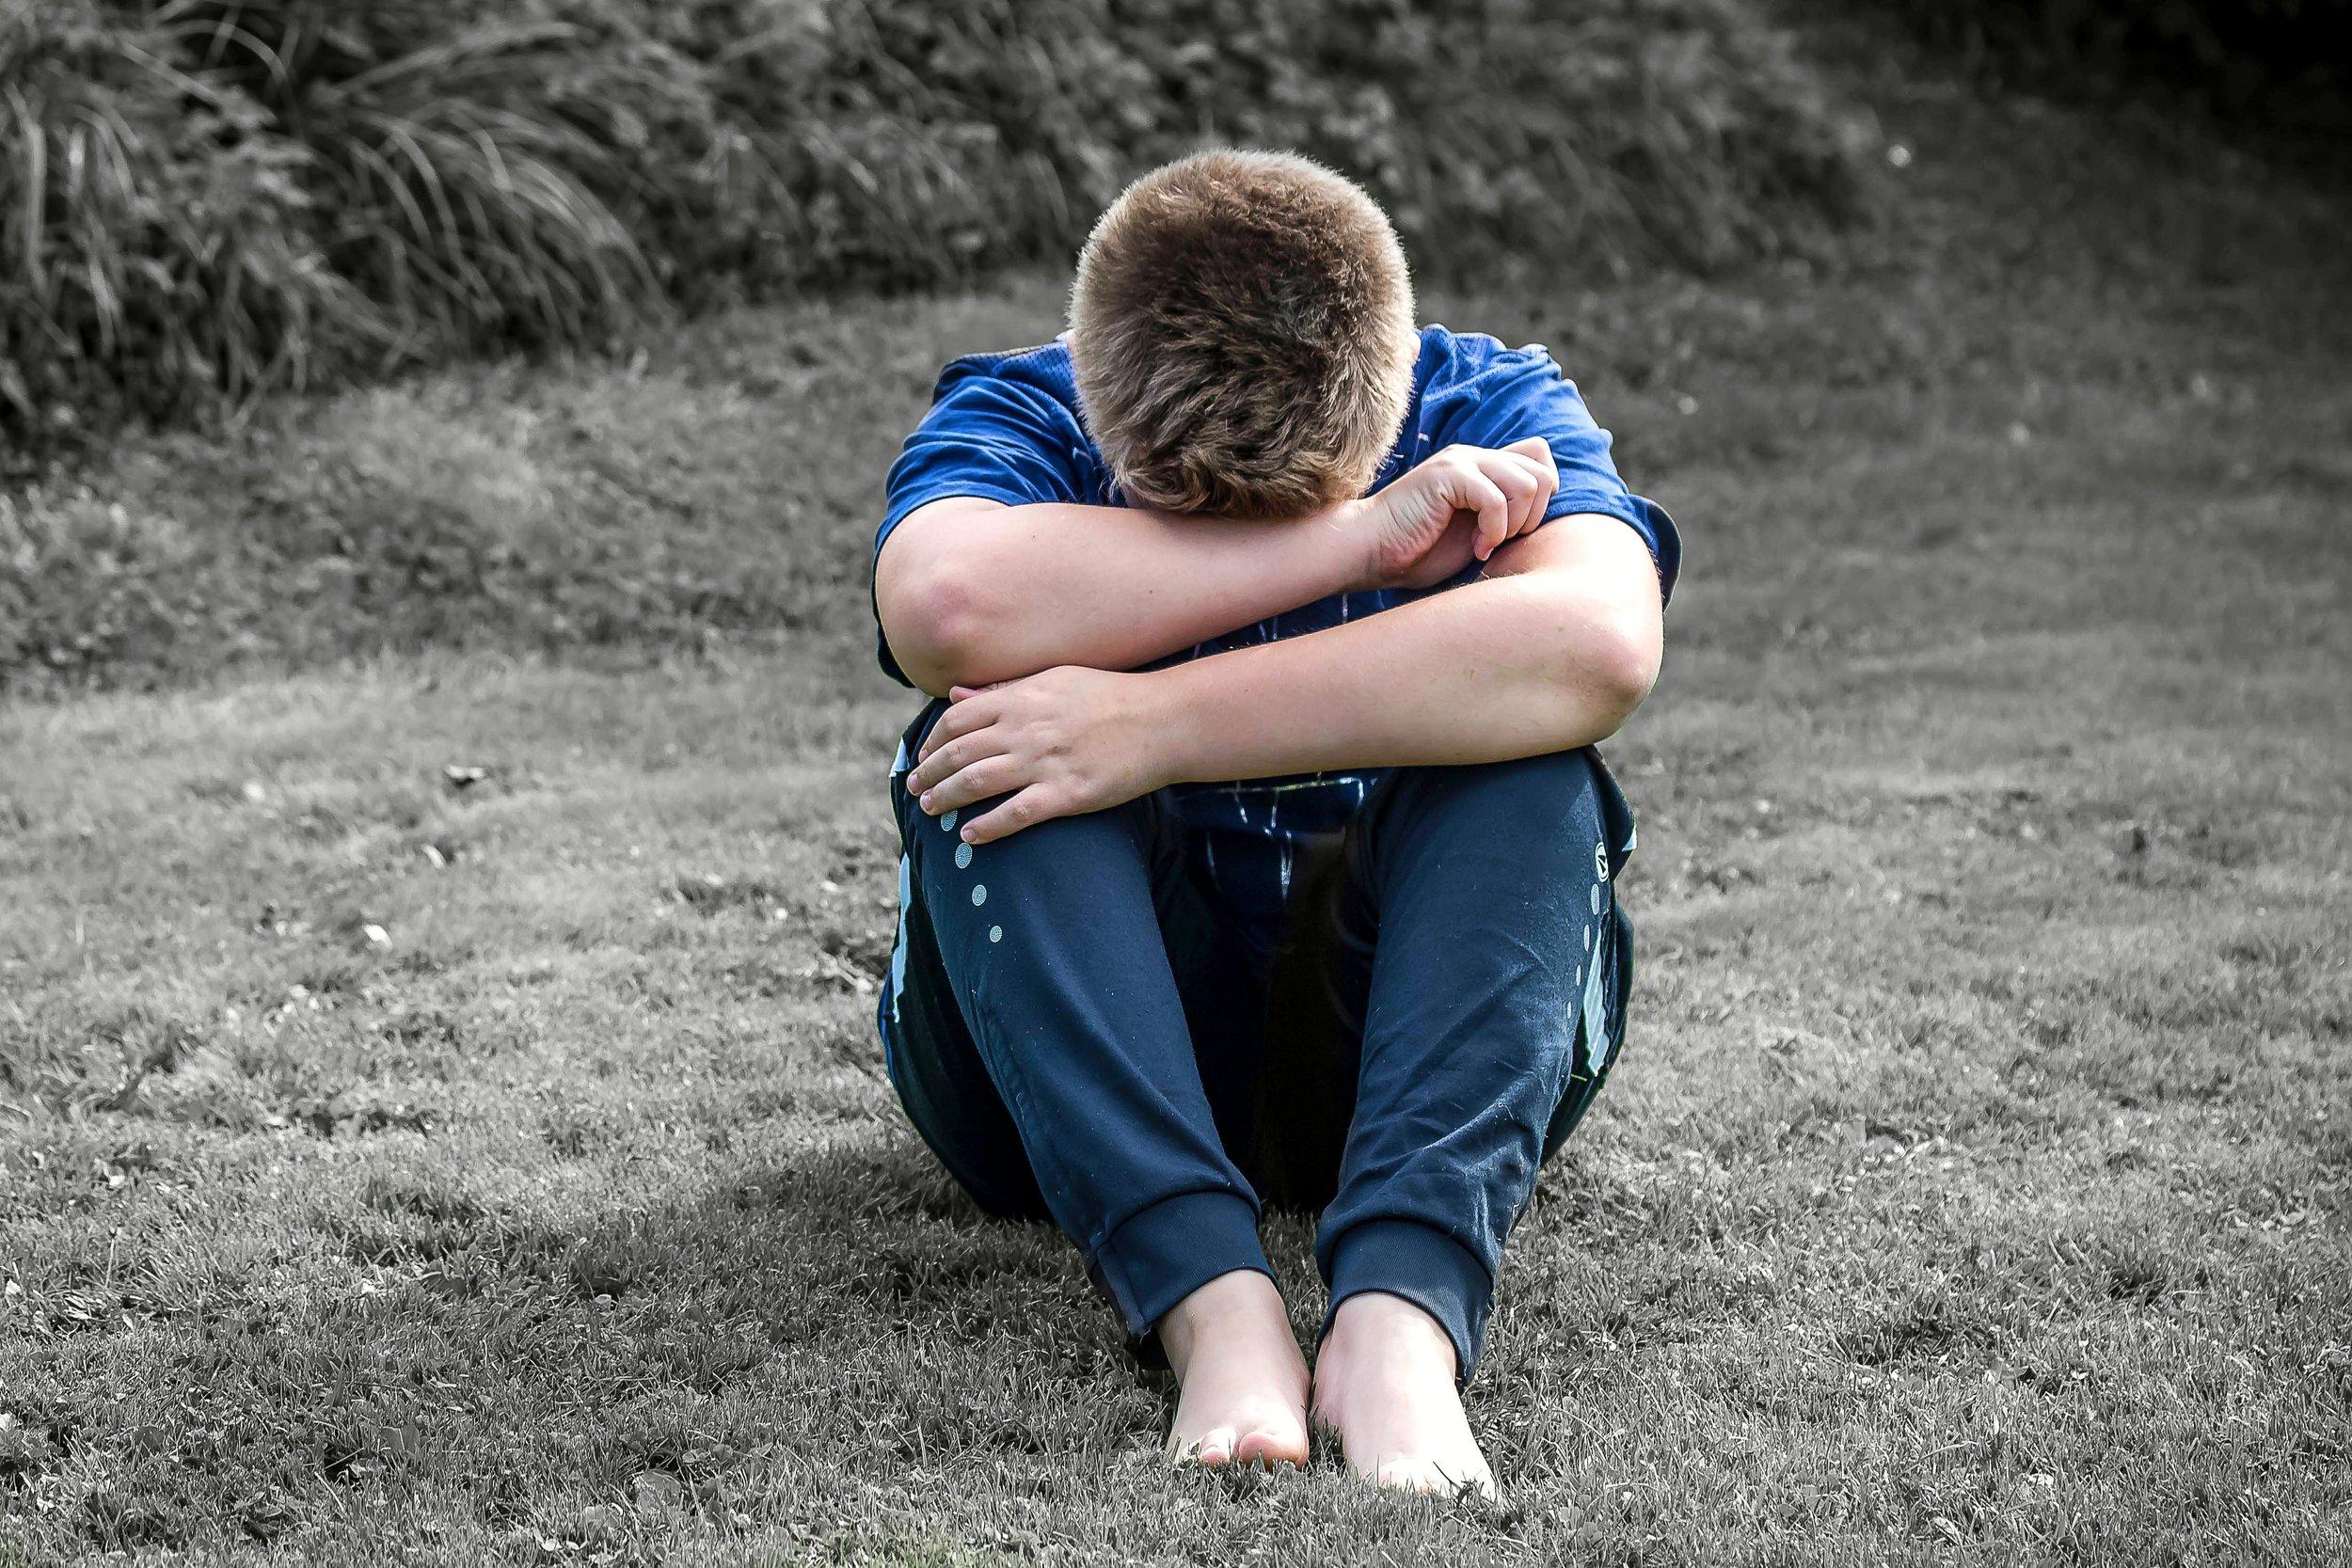 alone-boy-child-256658.jpg